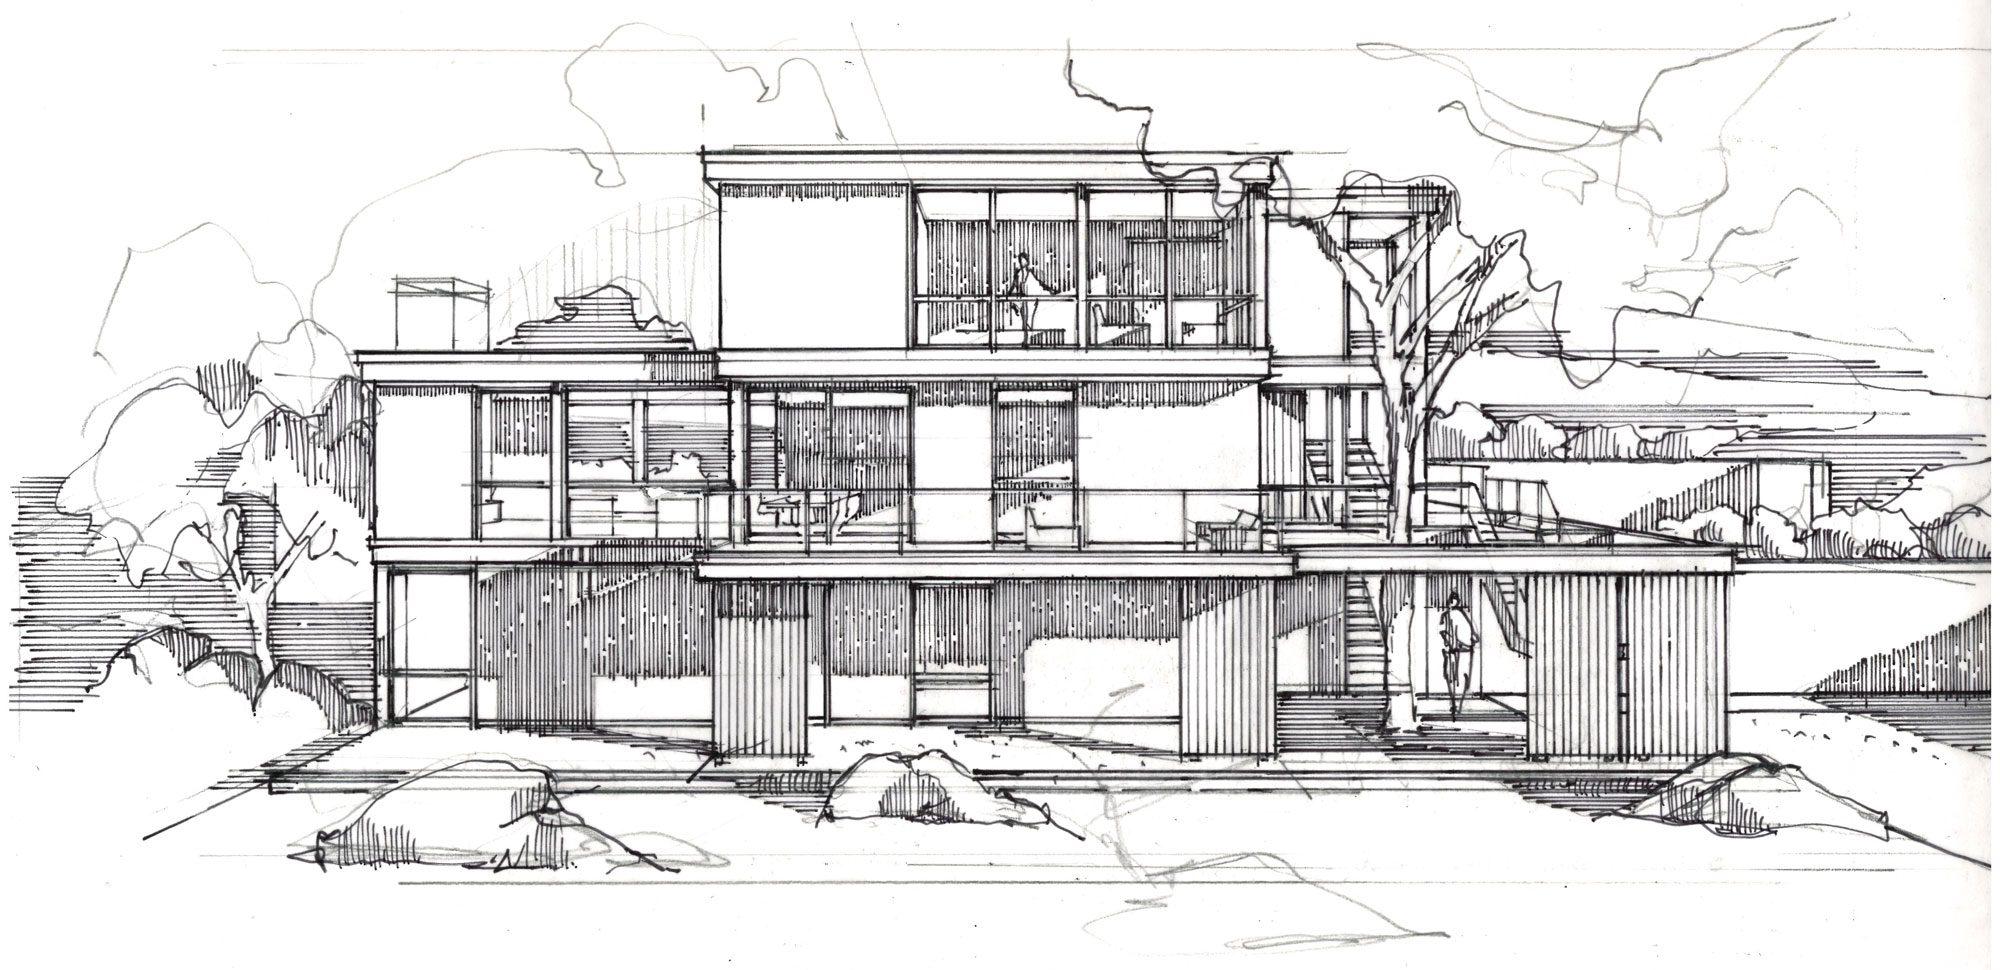 sketch of exterior annisquam river house